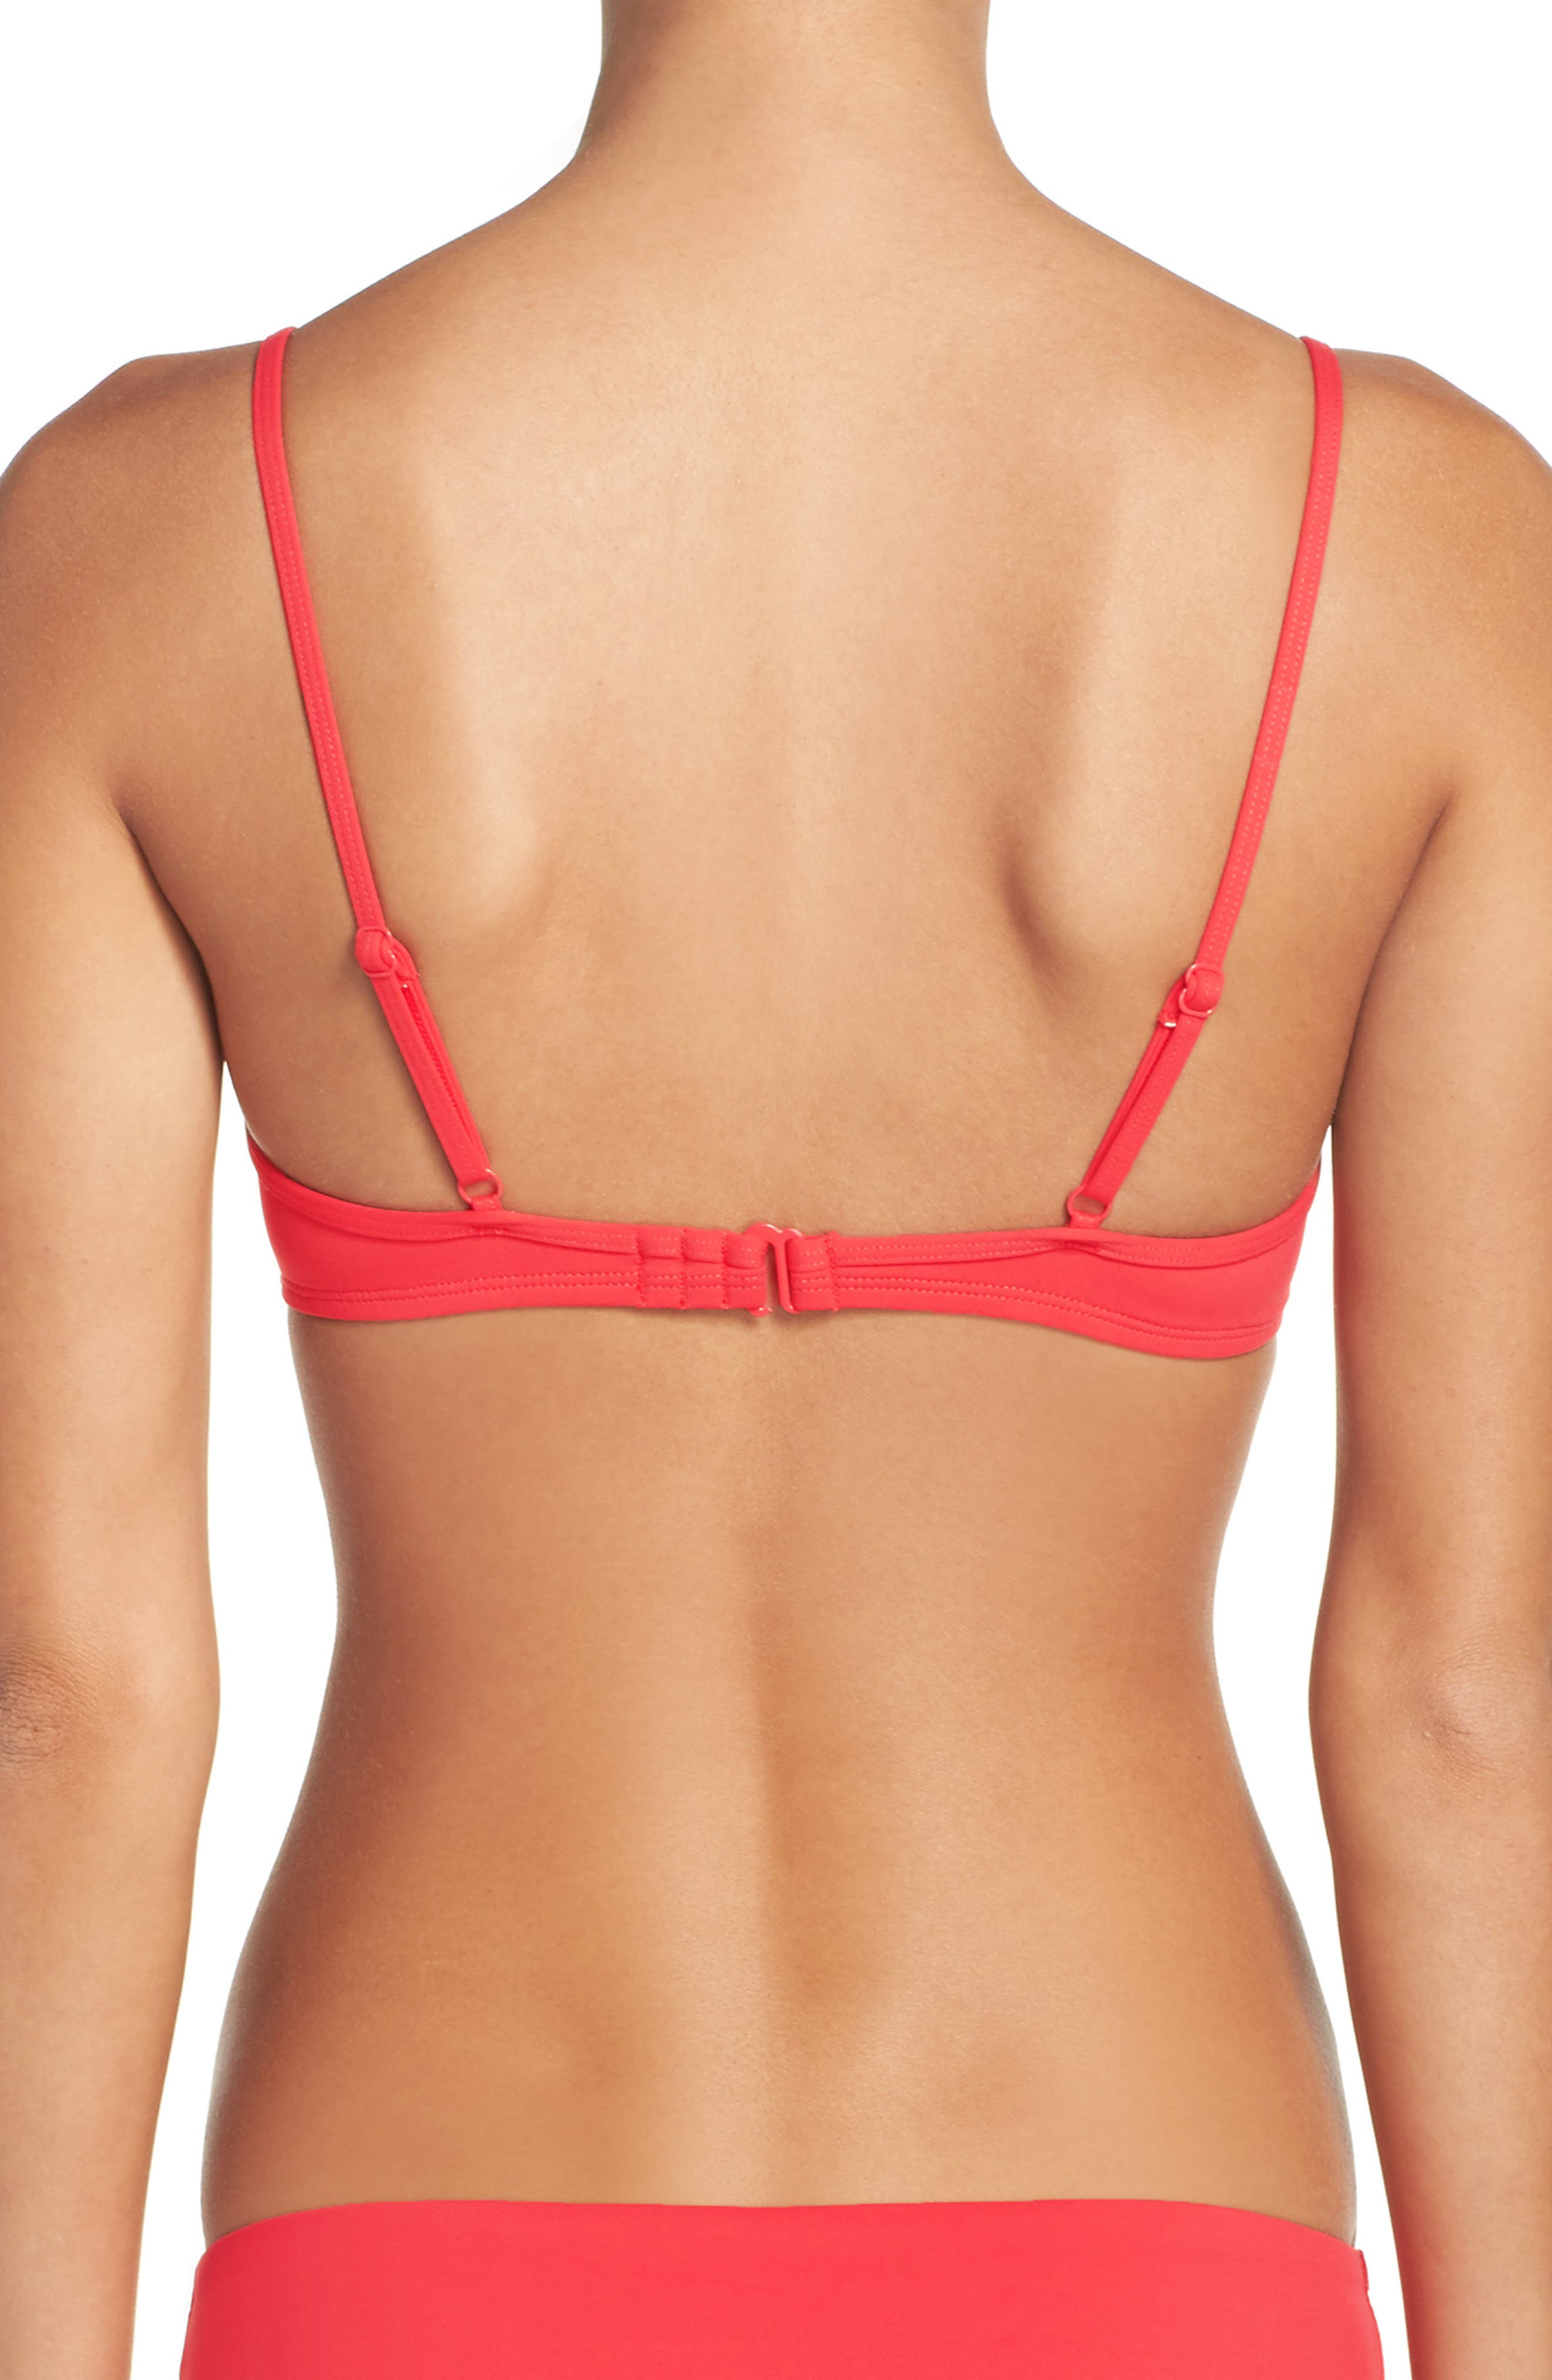 Alternate Image 2  - J.Crew Scalloped Italian Matte Bikini Top